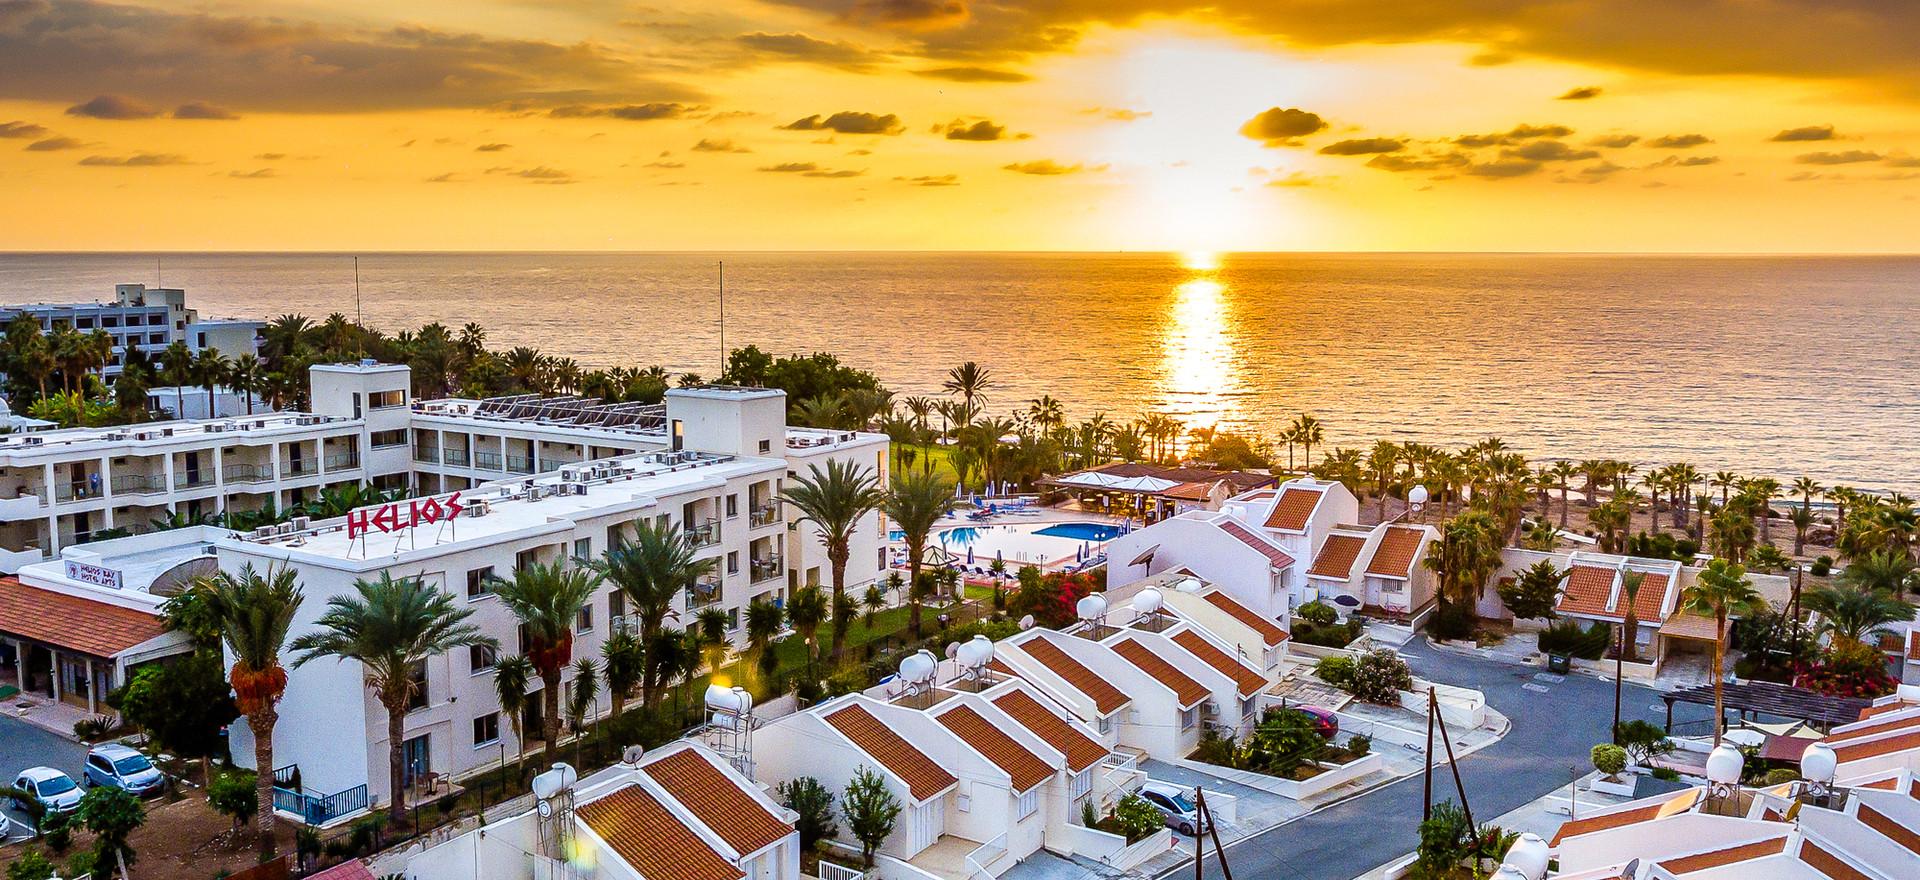 Helios Bay Sunset